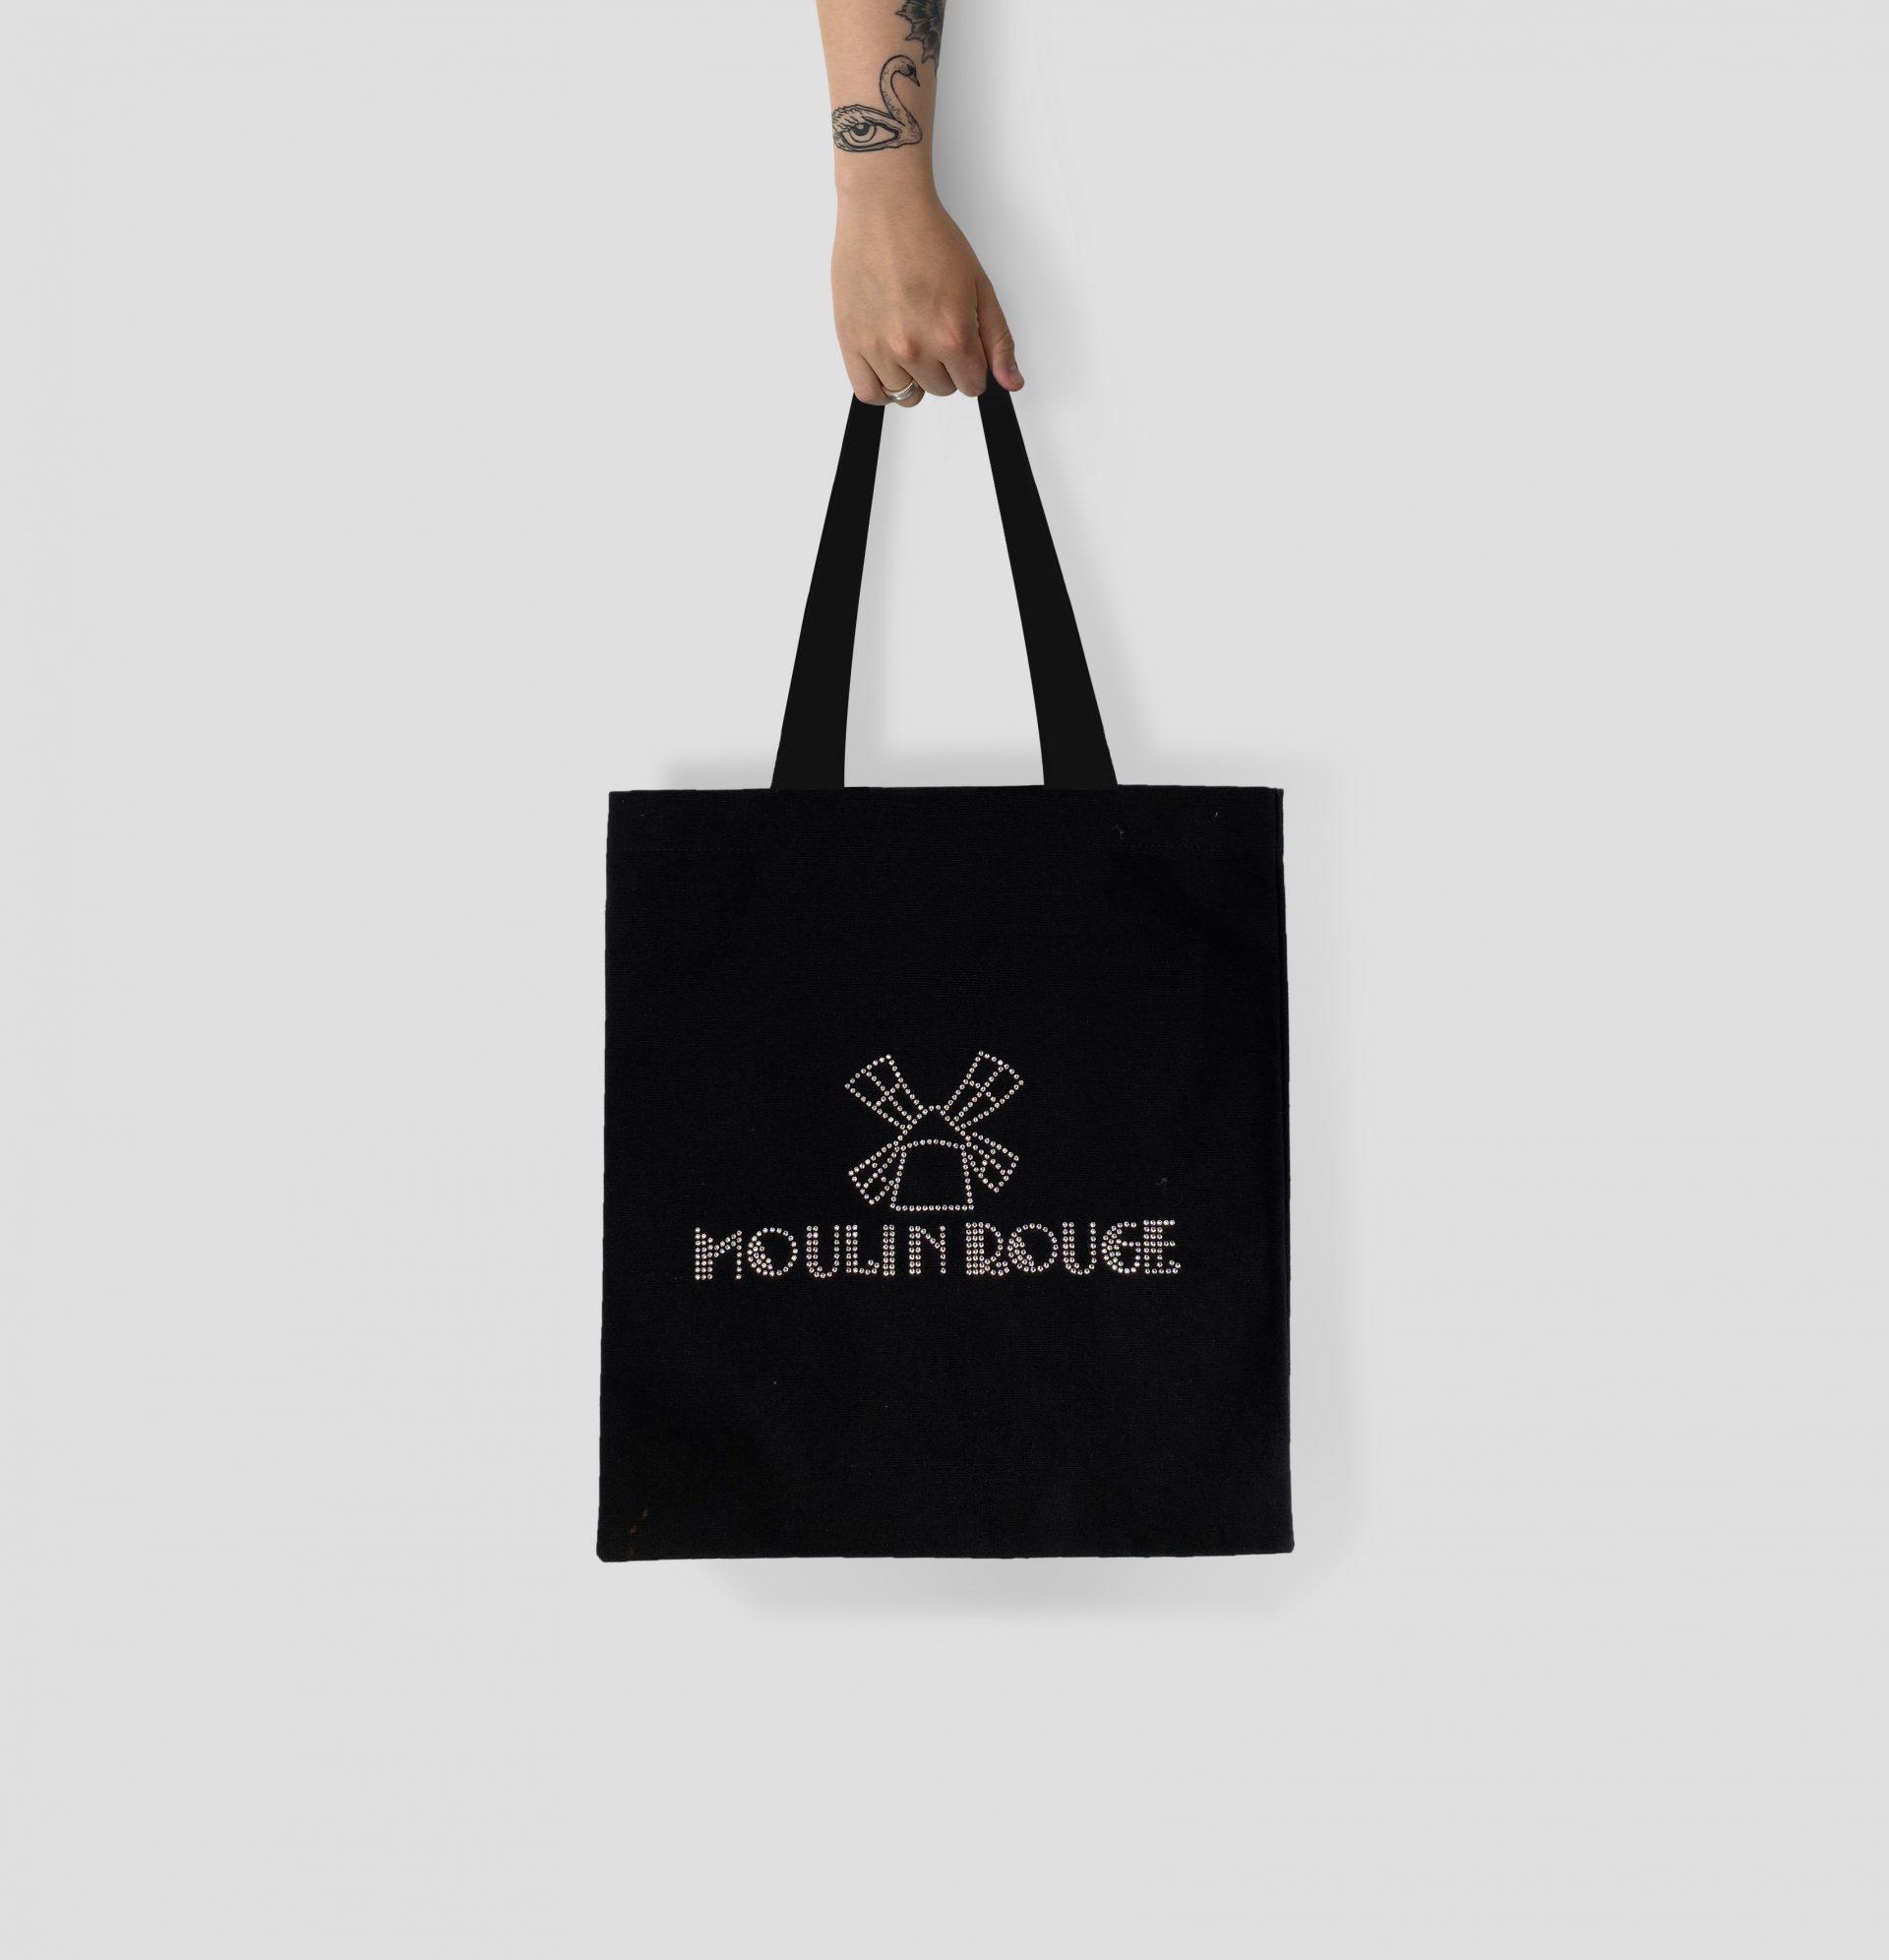 Swarovski® Moulin Rouge Printed tote Bag Lead image